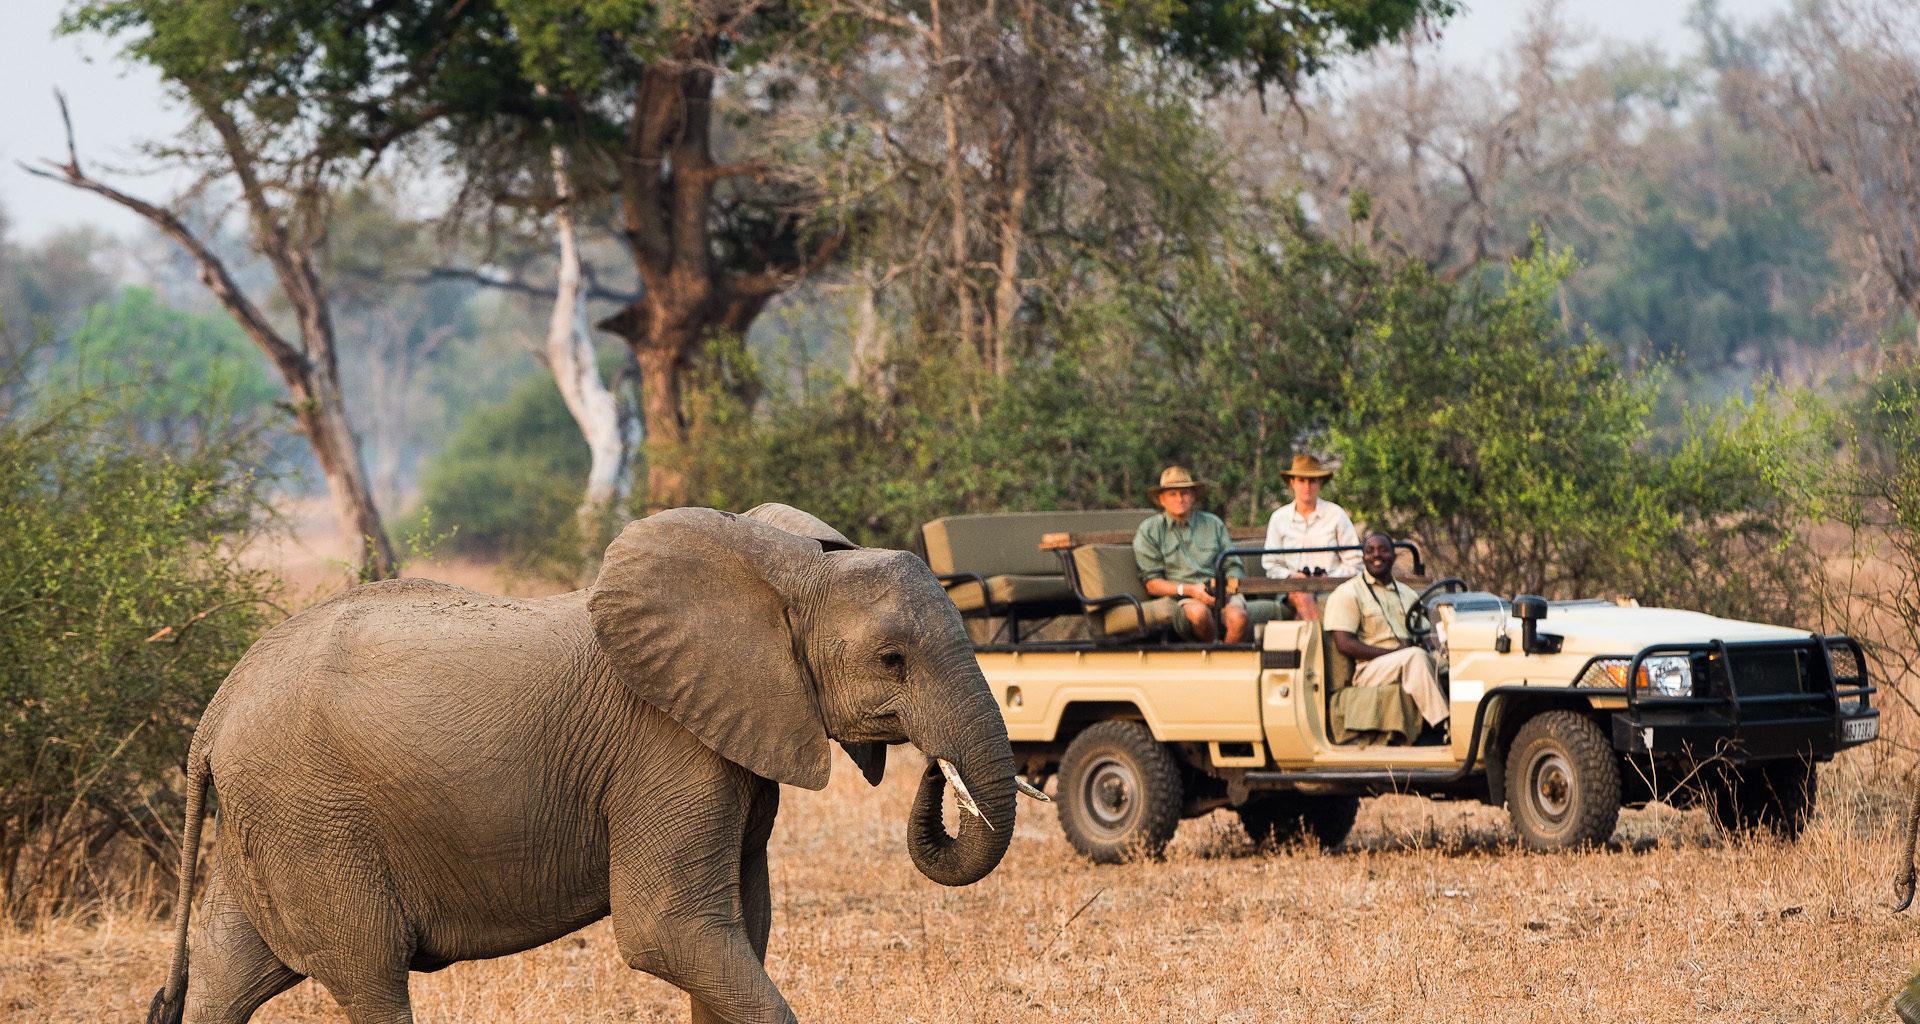 Nkwali Camp Zambia Elephant Safari